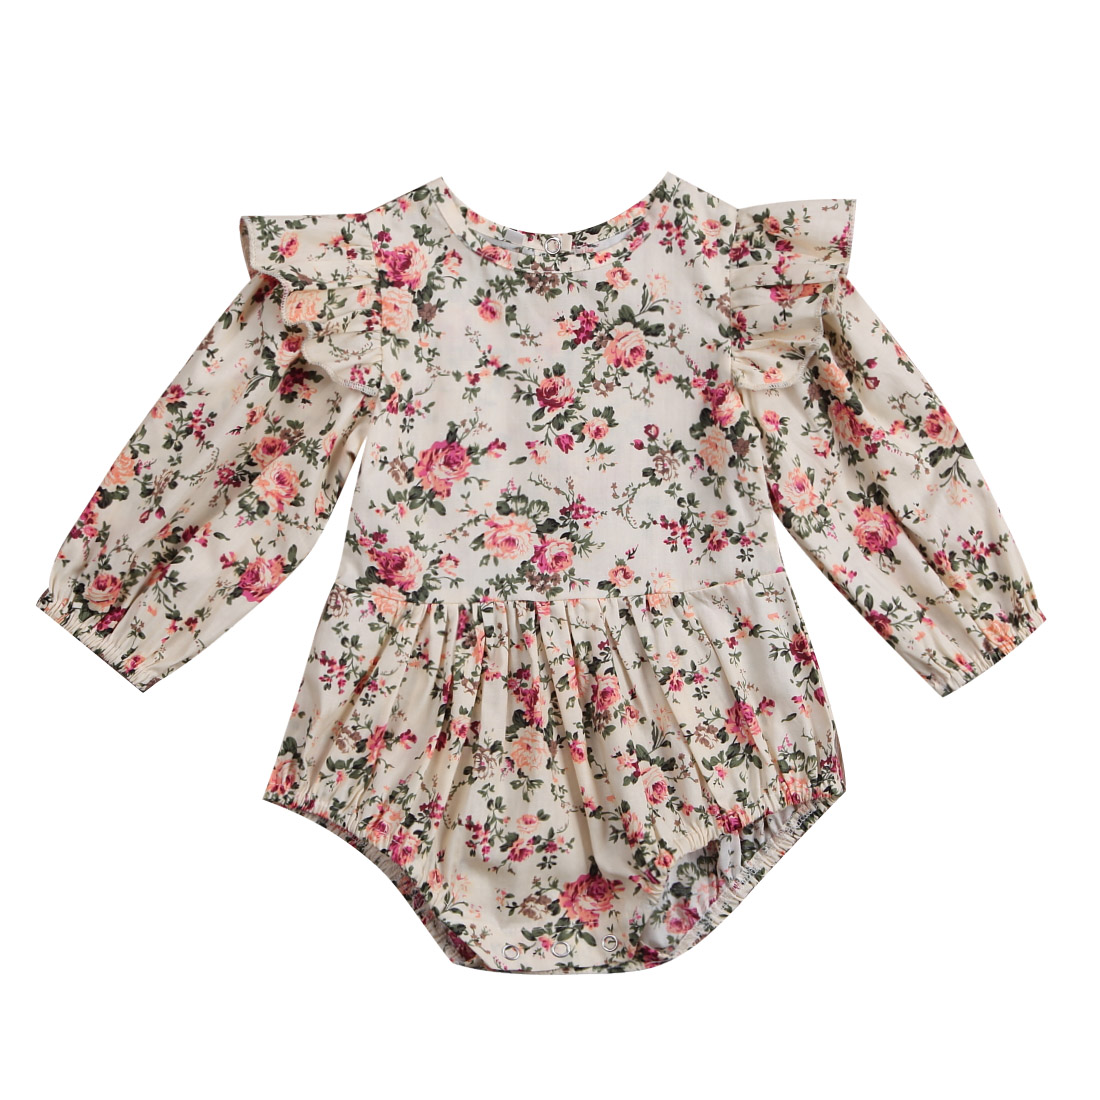 купить Flower Infant Toddler Baby Girl Romper Vintage Long Sleeve Neborn Girl Romper Jumpsuit Spring Autumn Baby Girl Clothing D15 по цене 288.31 рублей